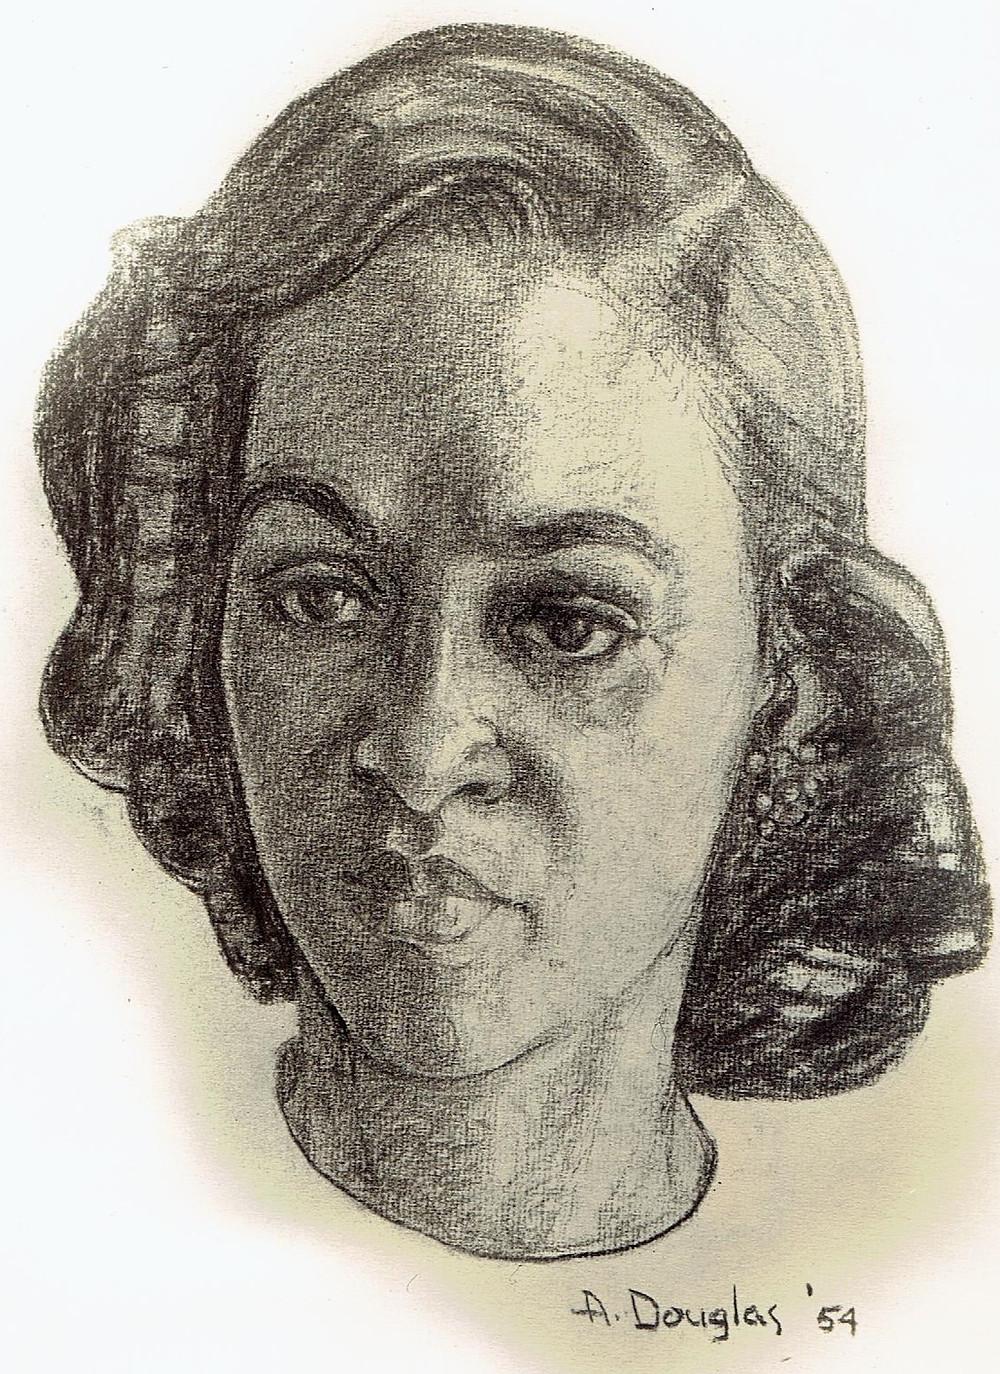 Aaron Douglas portrait of Anne Gamble